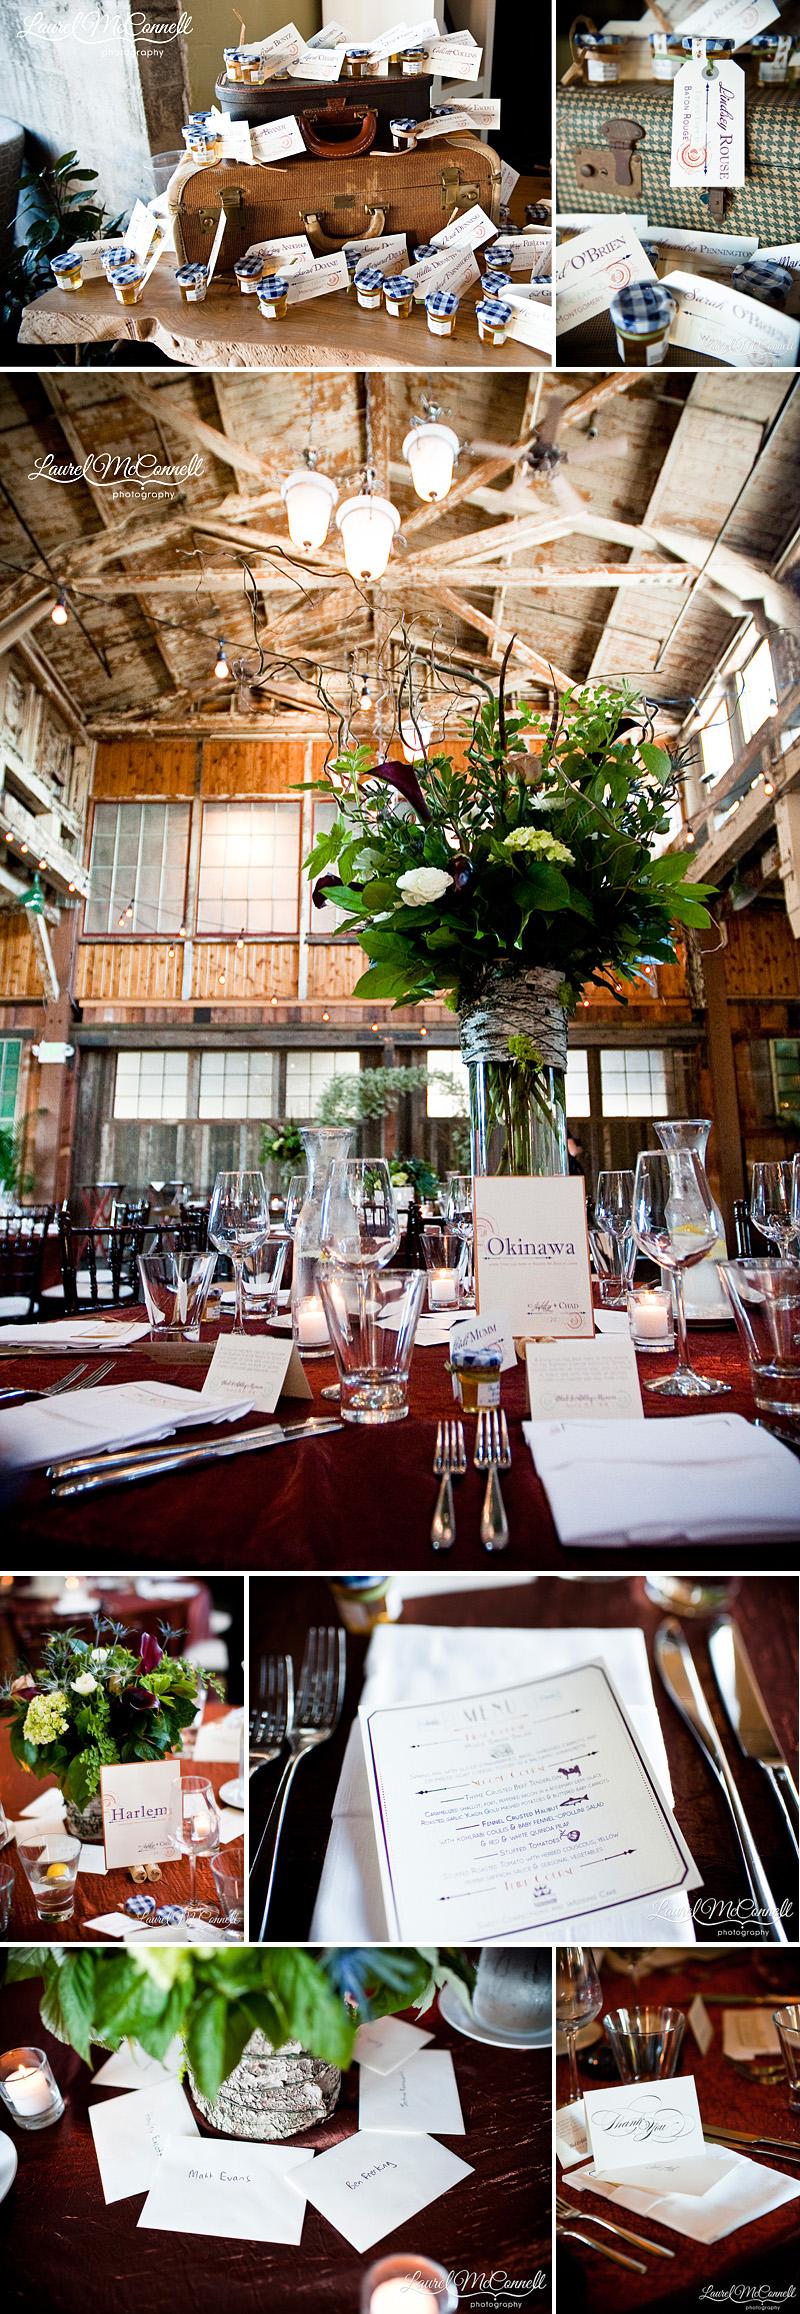 industrial wedding decor at sodo park copper birch eucalyptus feathers purple turqouise orange